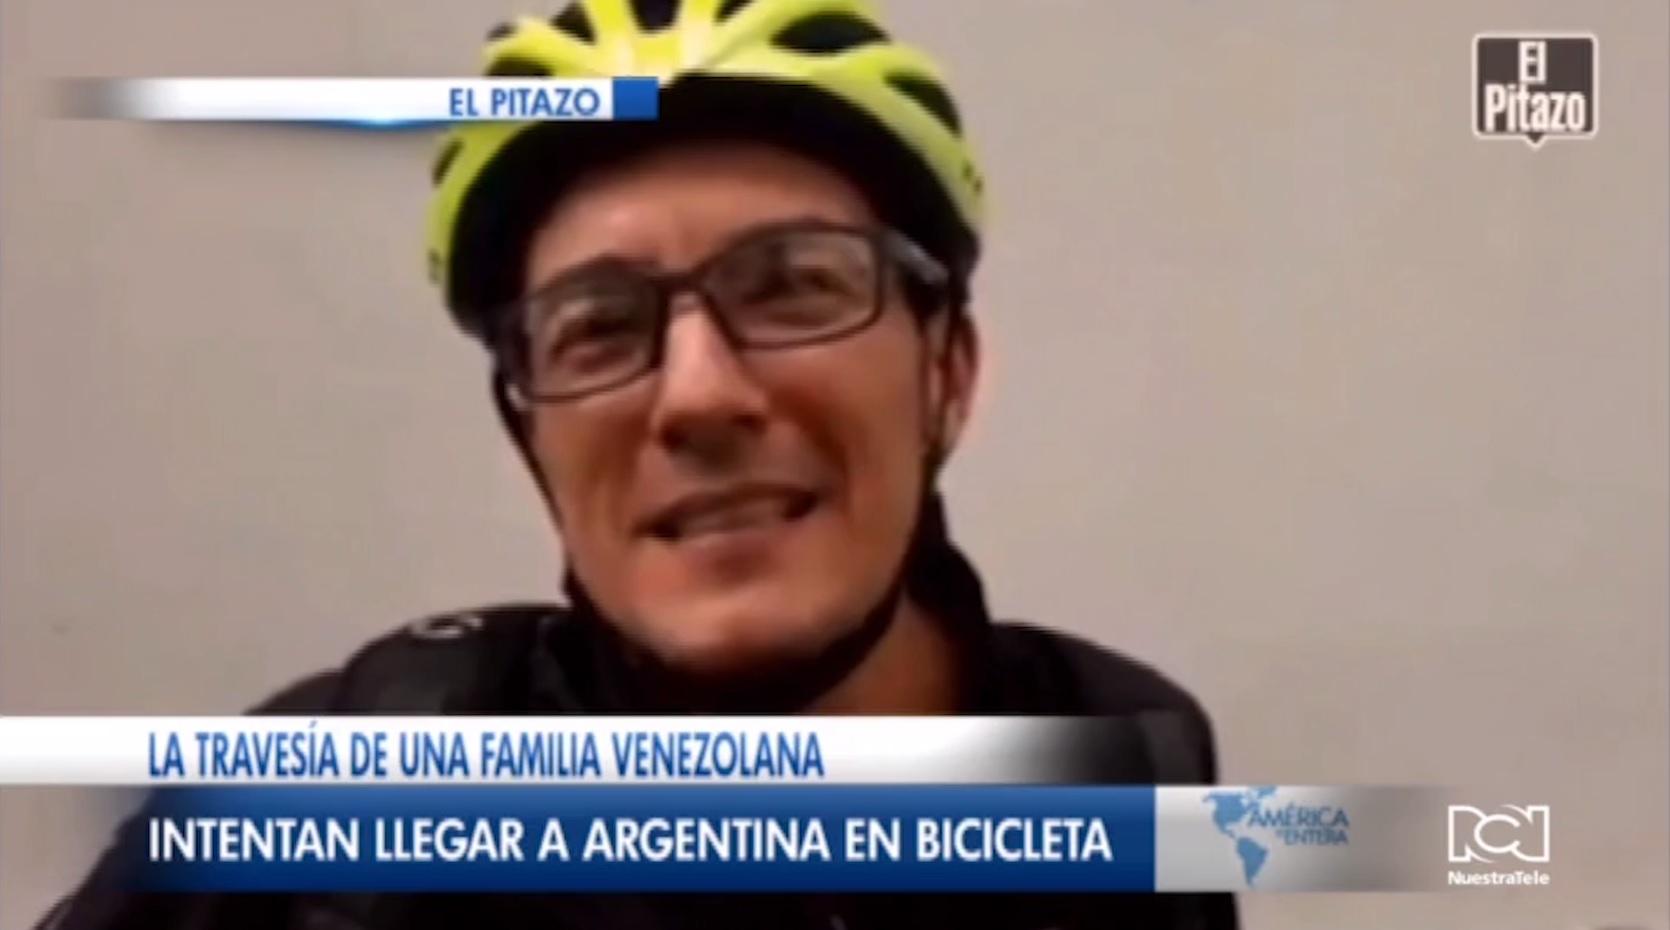 Familia venezolana intenta llegar a Argentina en bicicleta